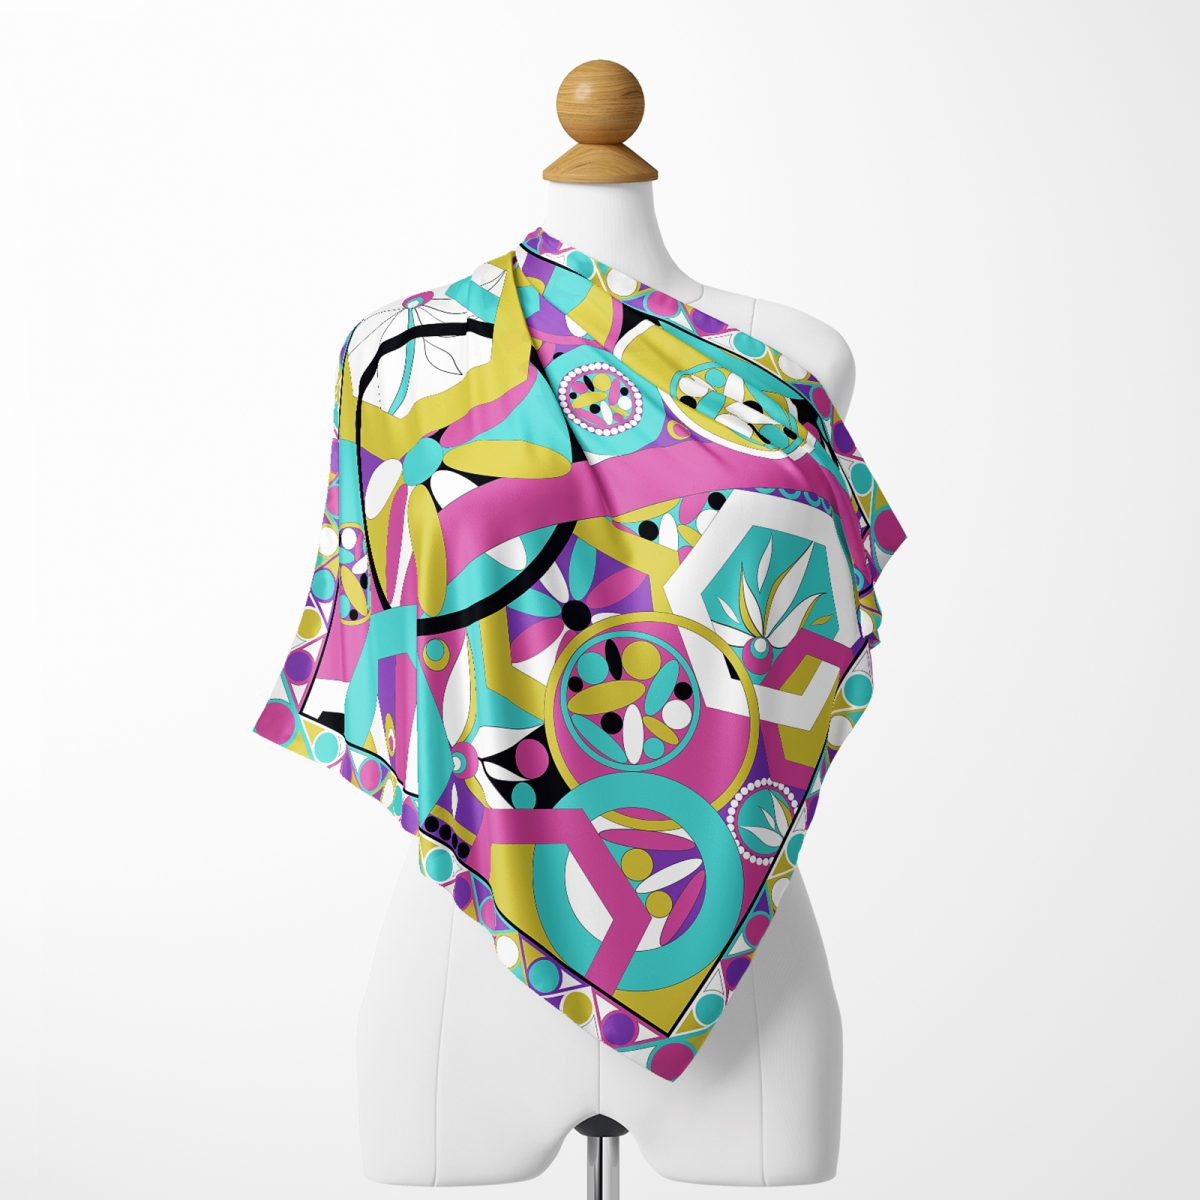 Realhomes Renkli Desenler Dijtal Baskılı Modern Tivil Eşarp Realhomes